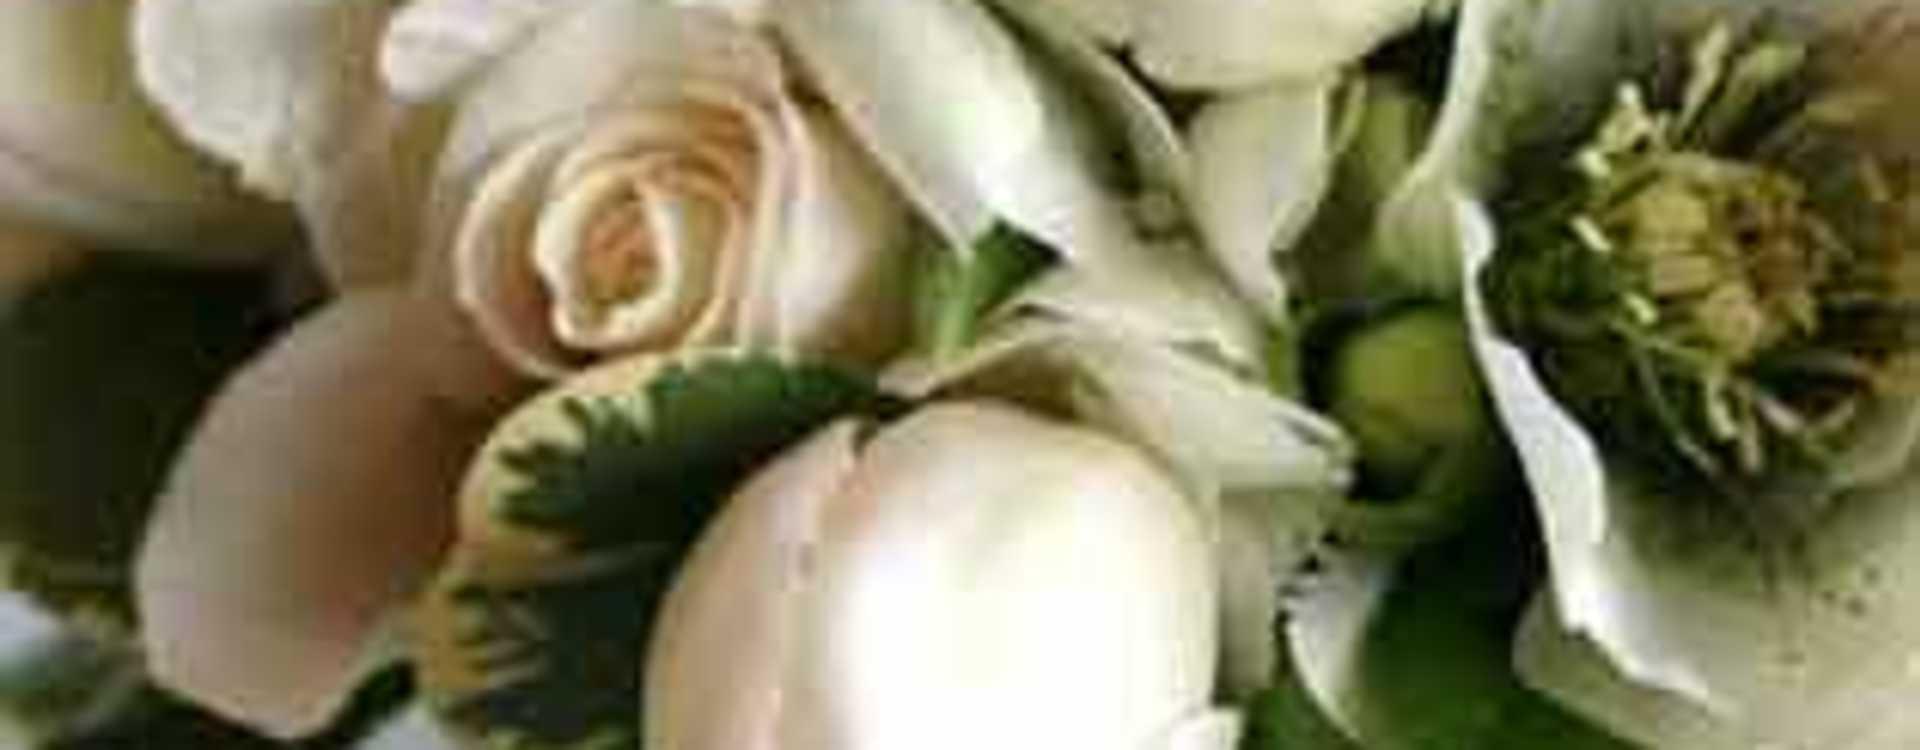 Flora_Laura__Marine_View_Florist_-5.jpg